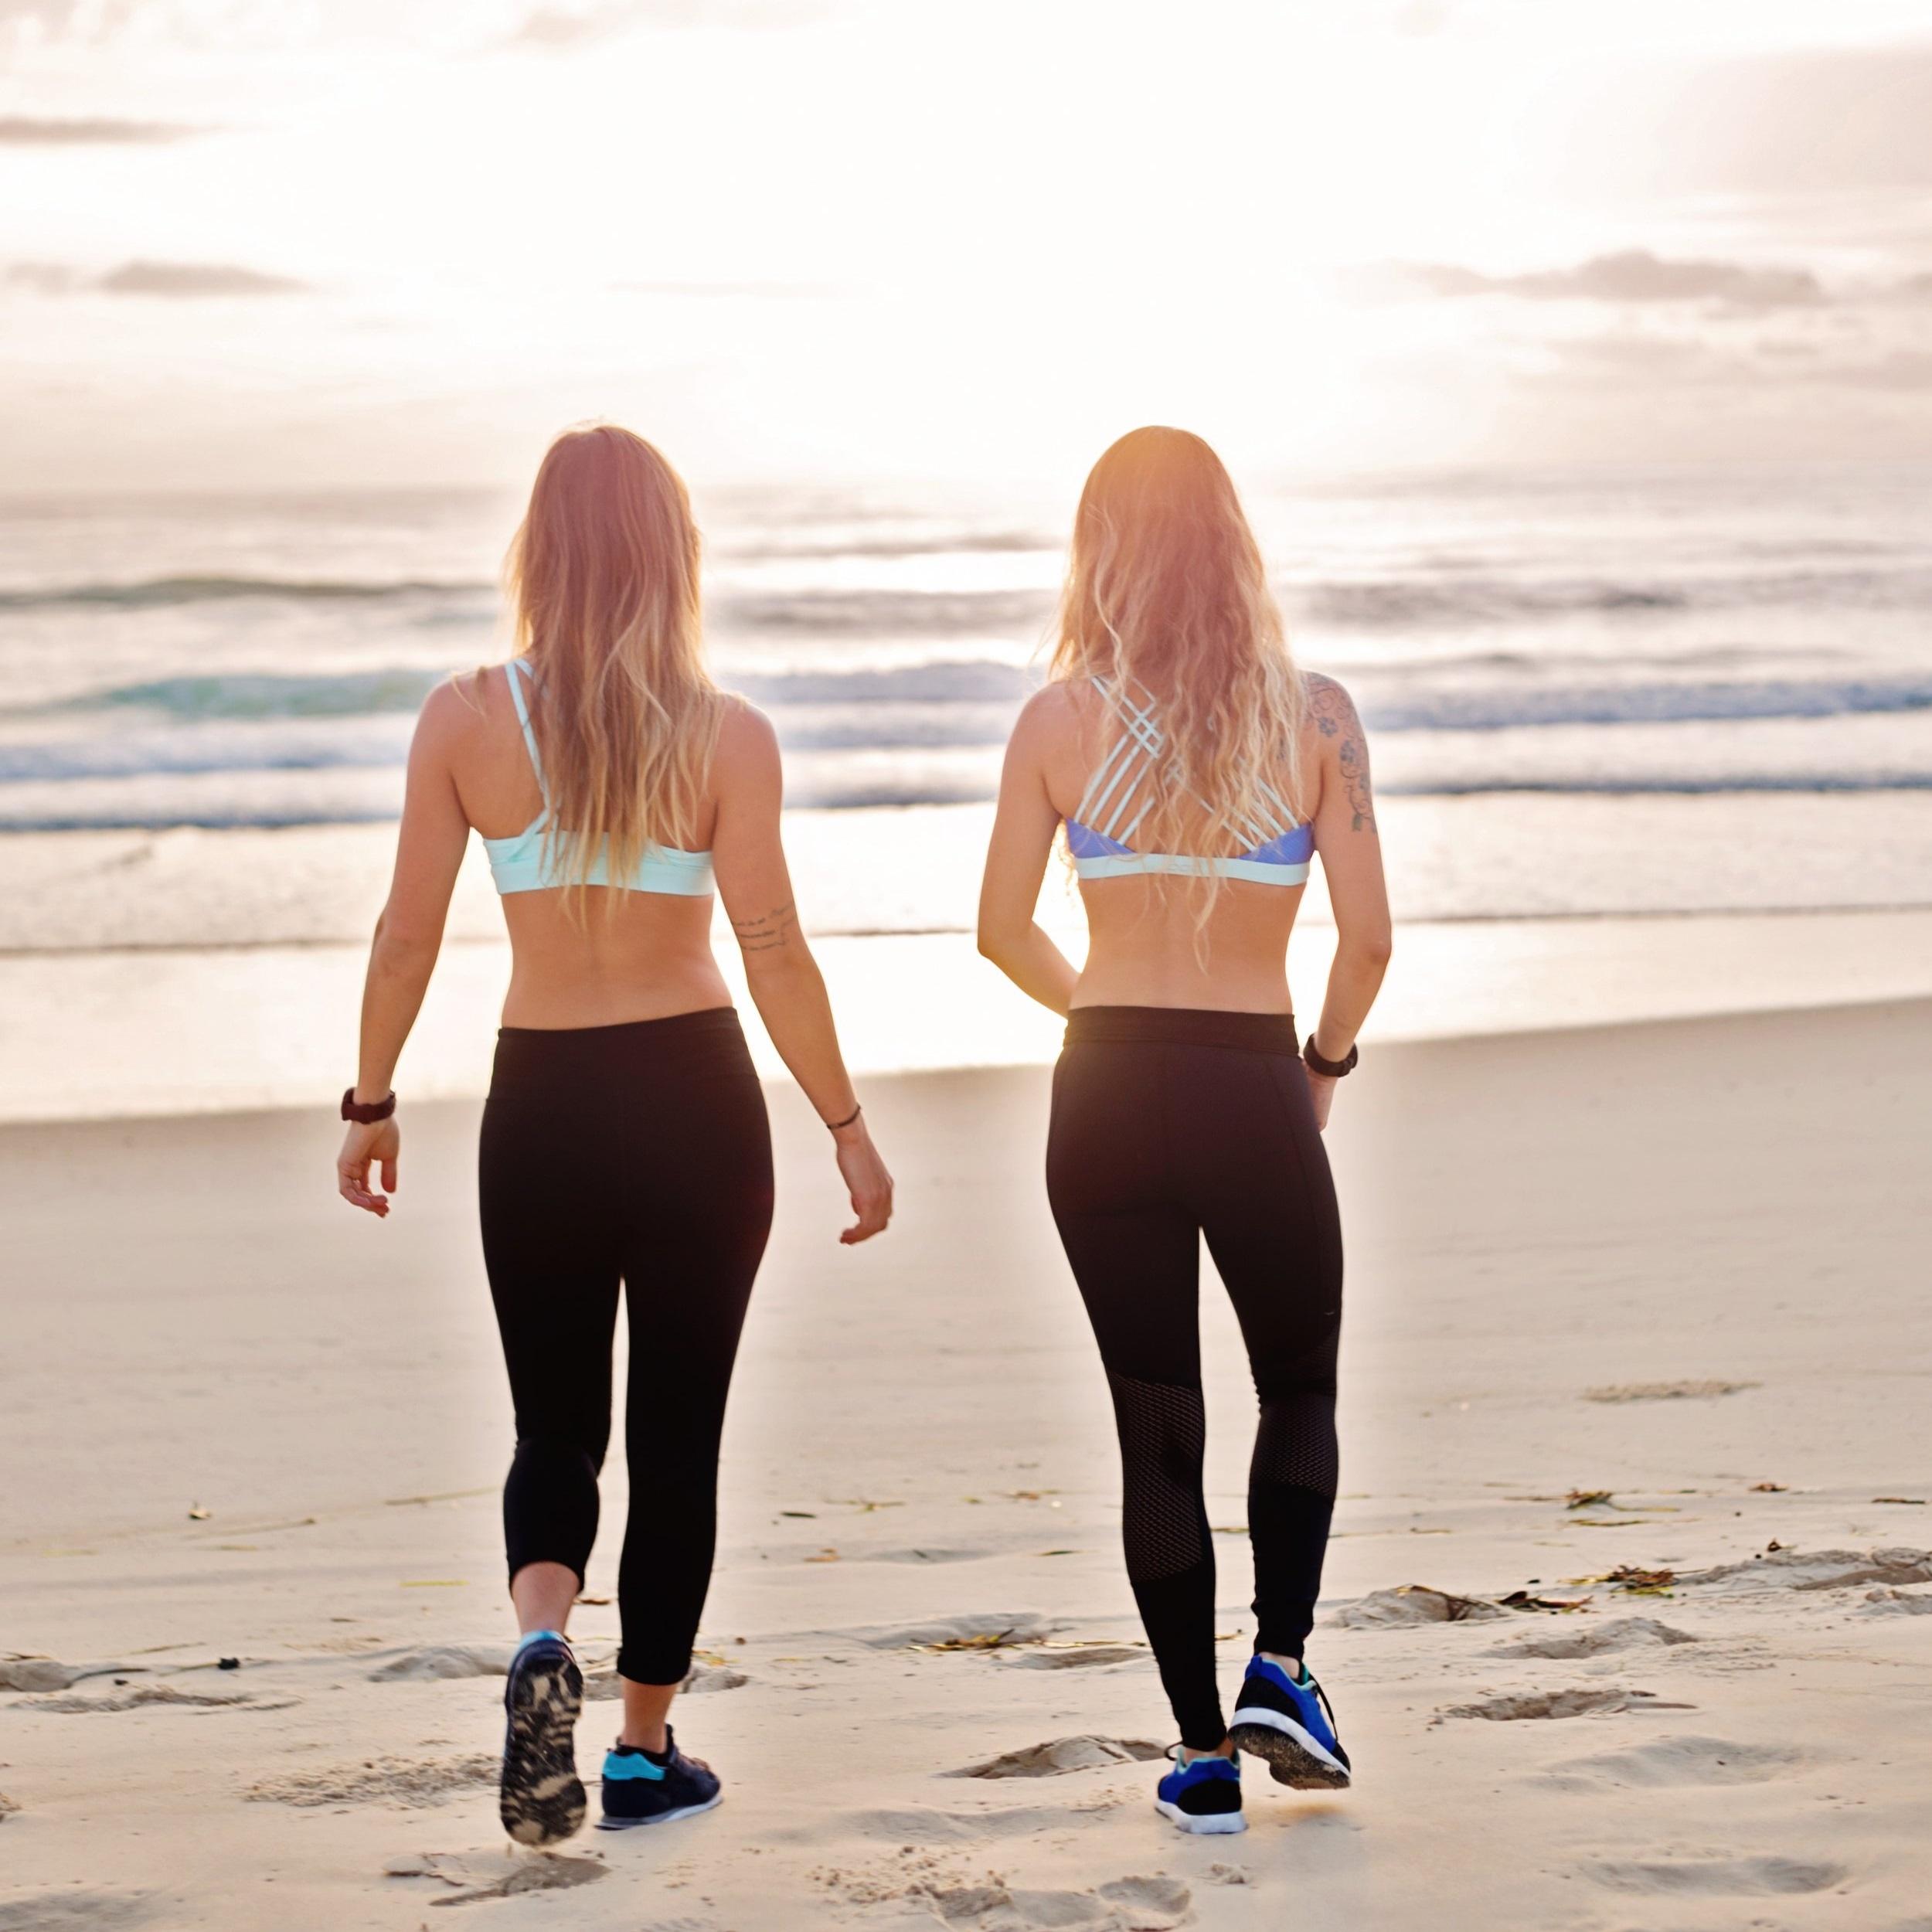 beach-blond-hair-girls-1300520.jpg